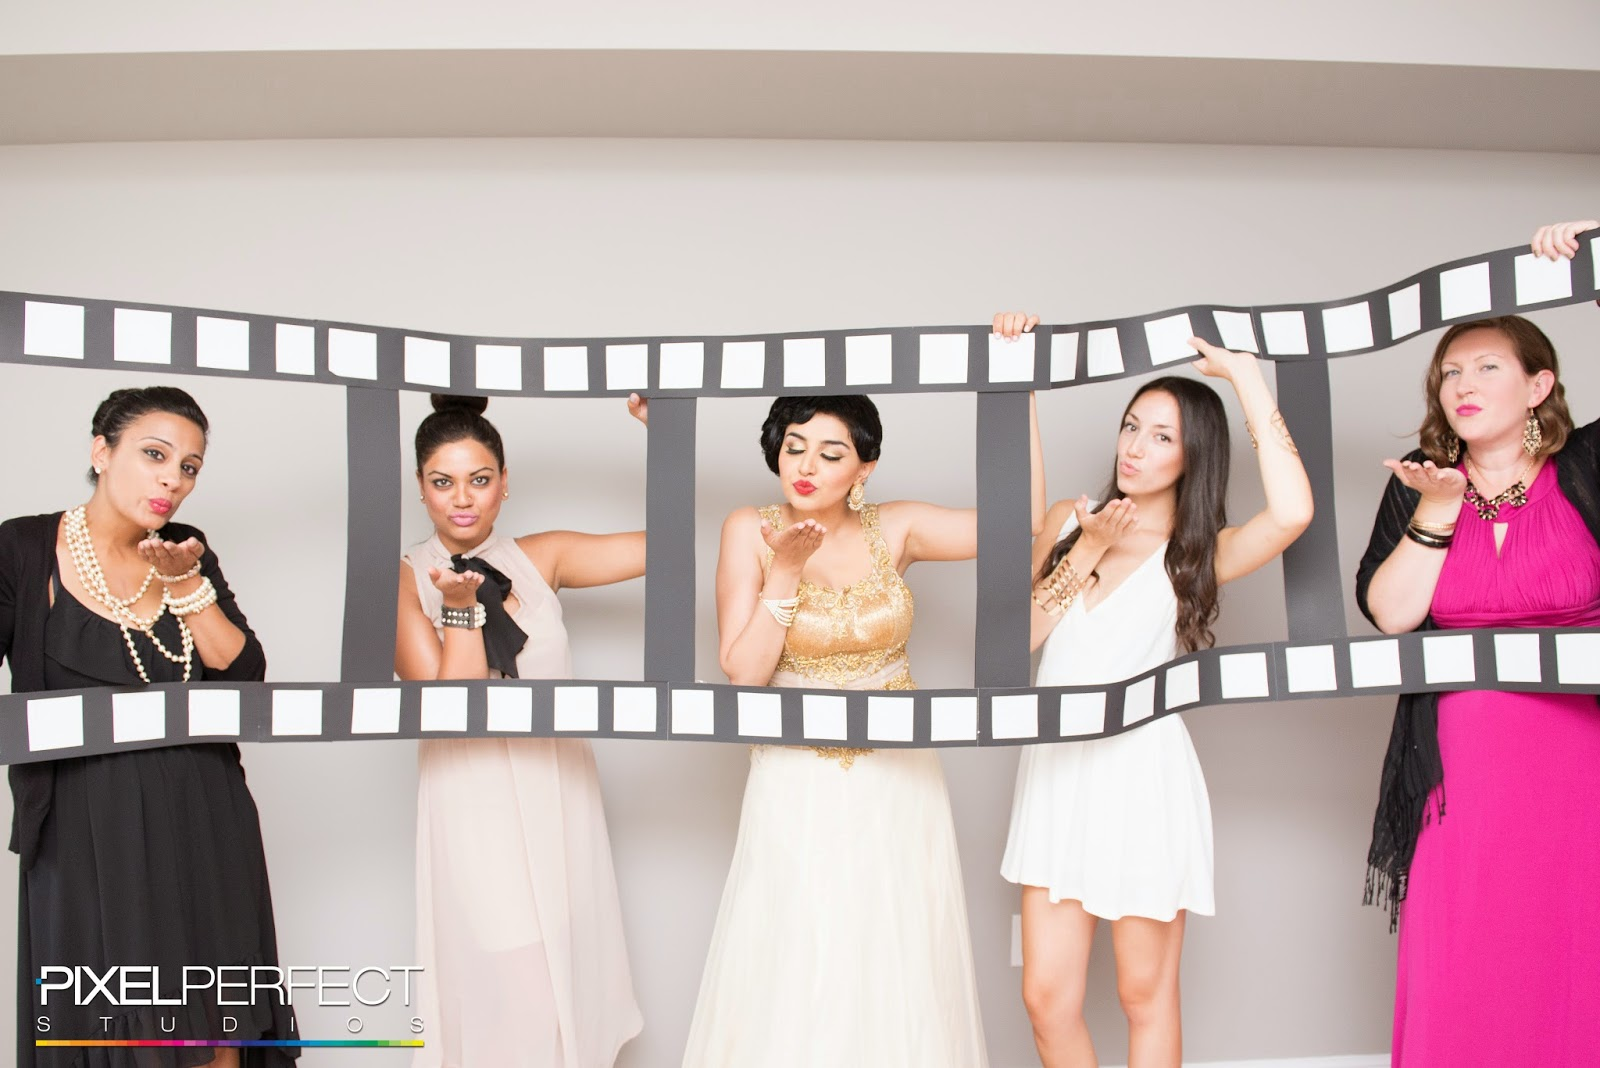 Diy wedding shower decorations  andrea arnau aarnaum on Pinterest